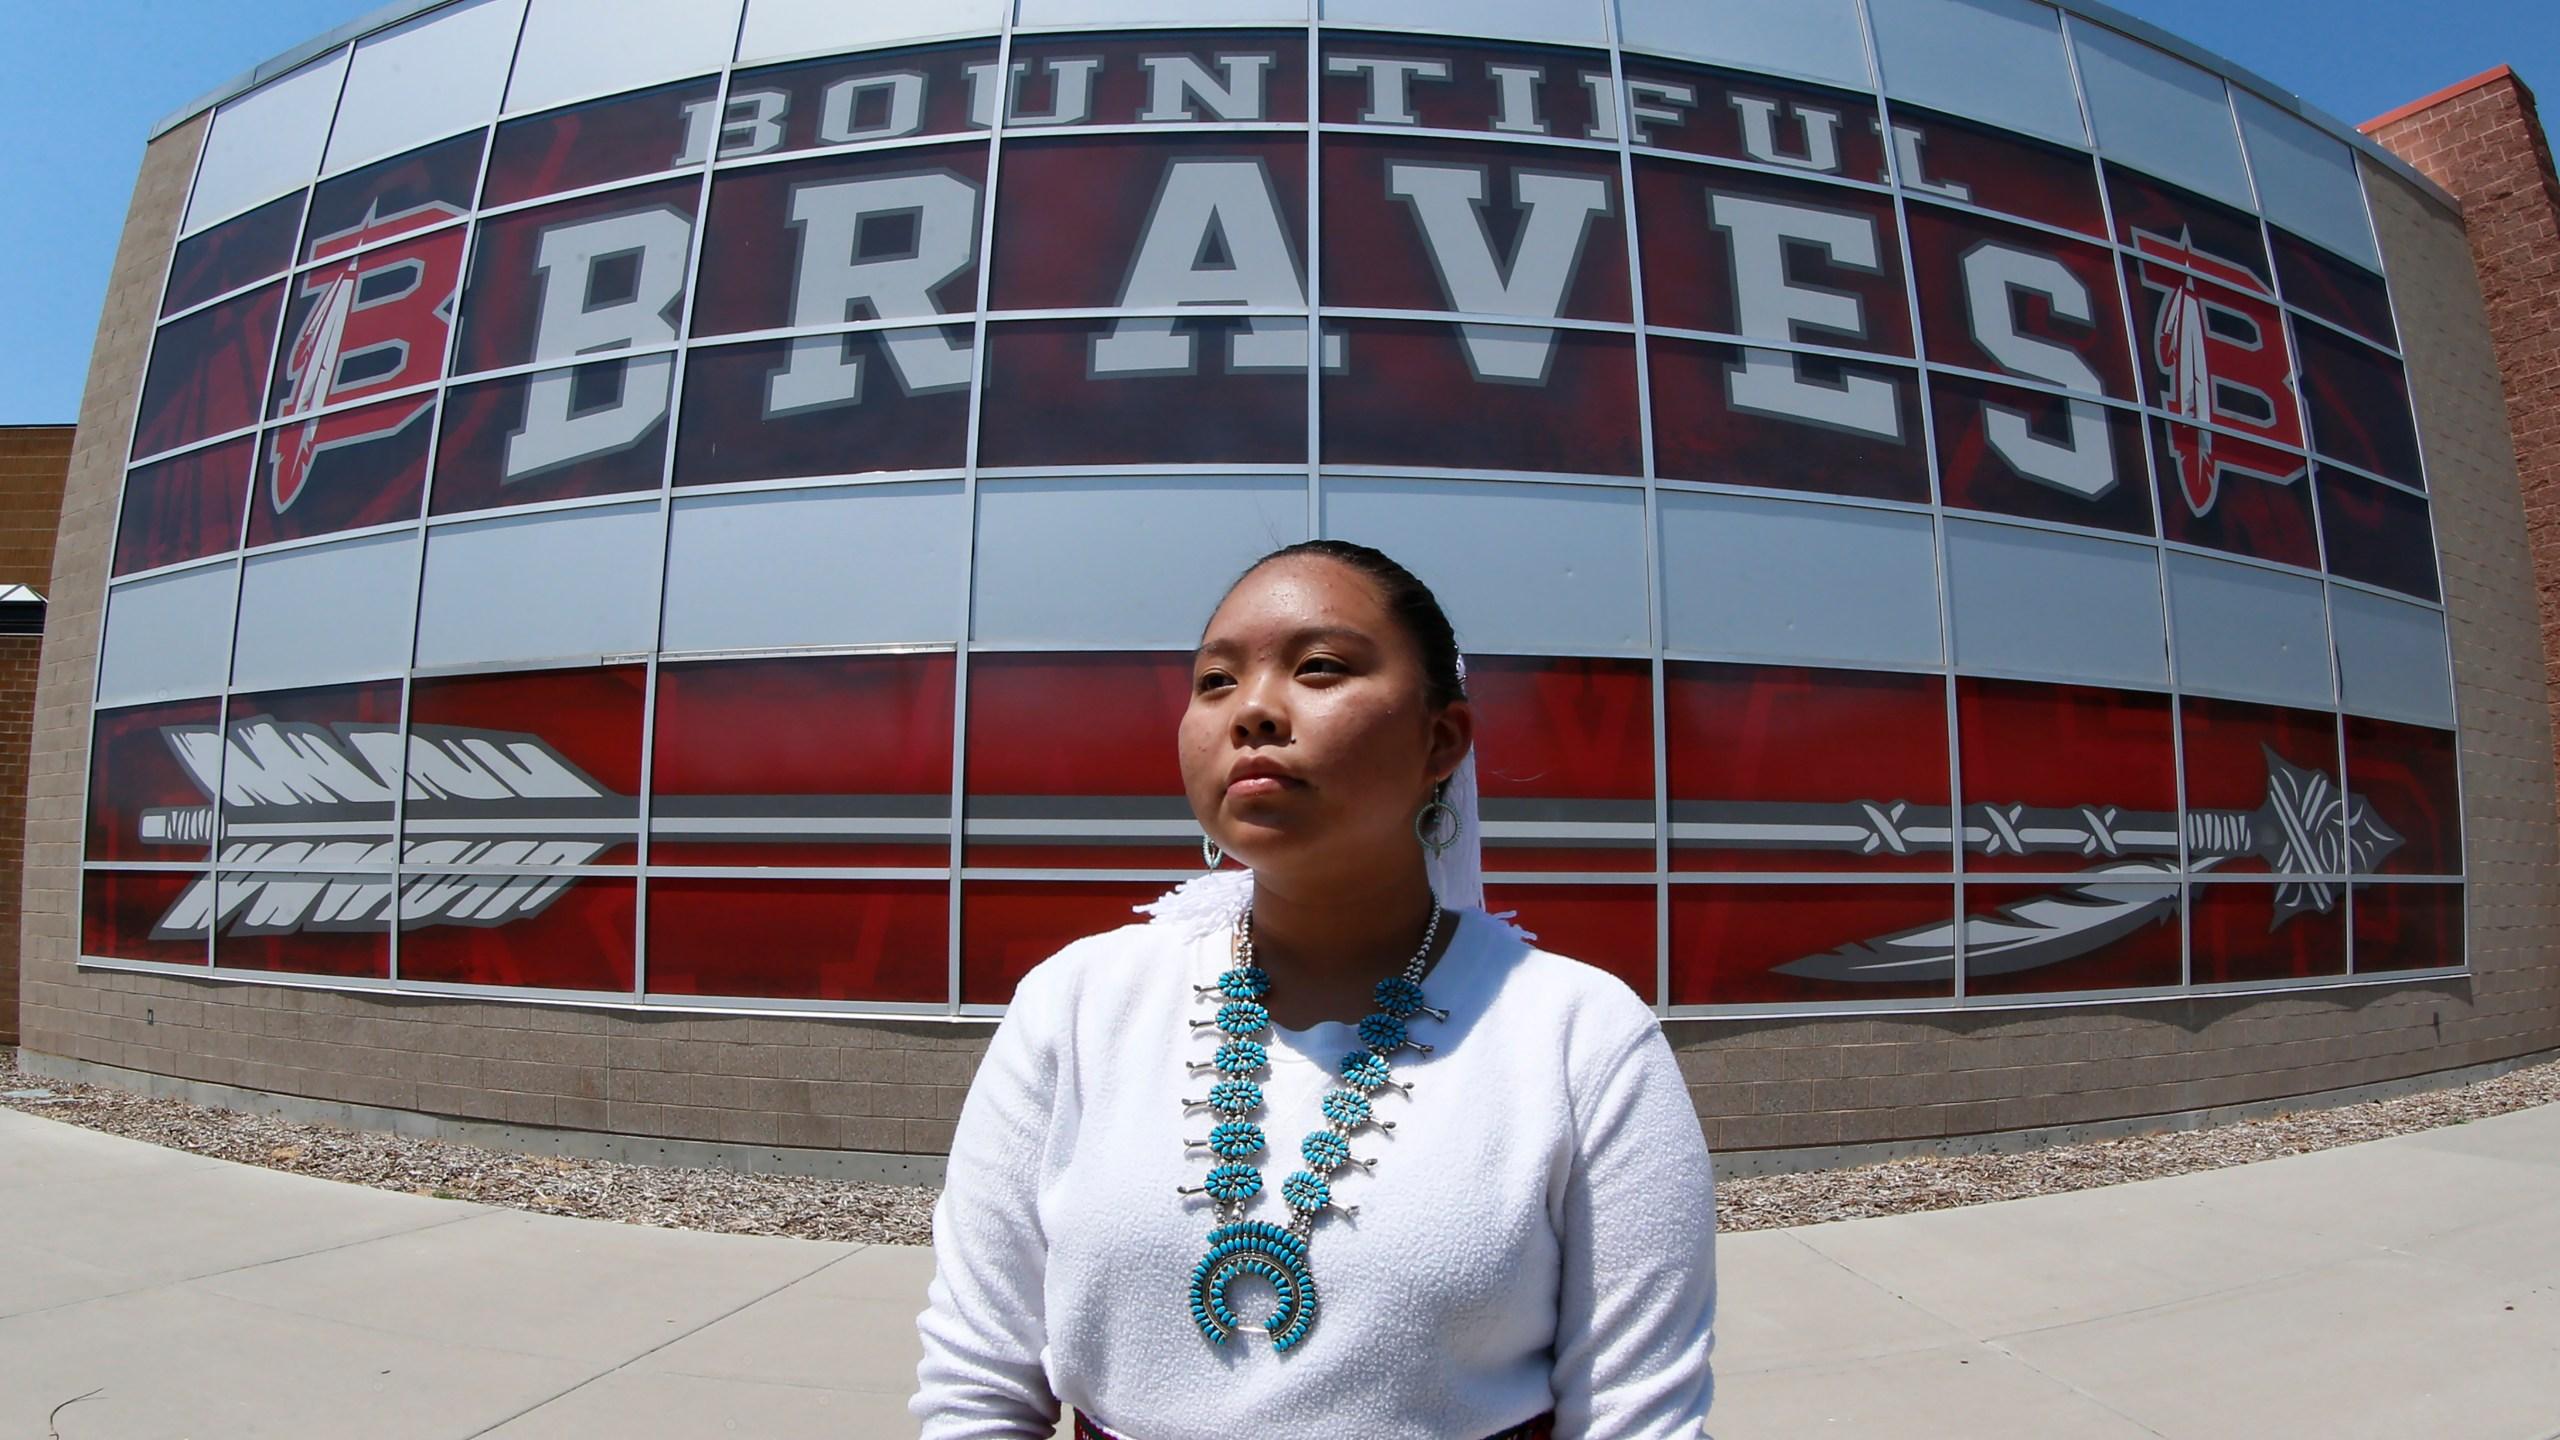 Christmas 2020 Jobs In Bountiful Utah Native mascots still a sticking point in high school sports | WJHL